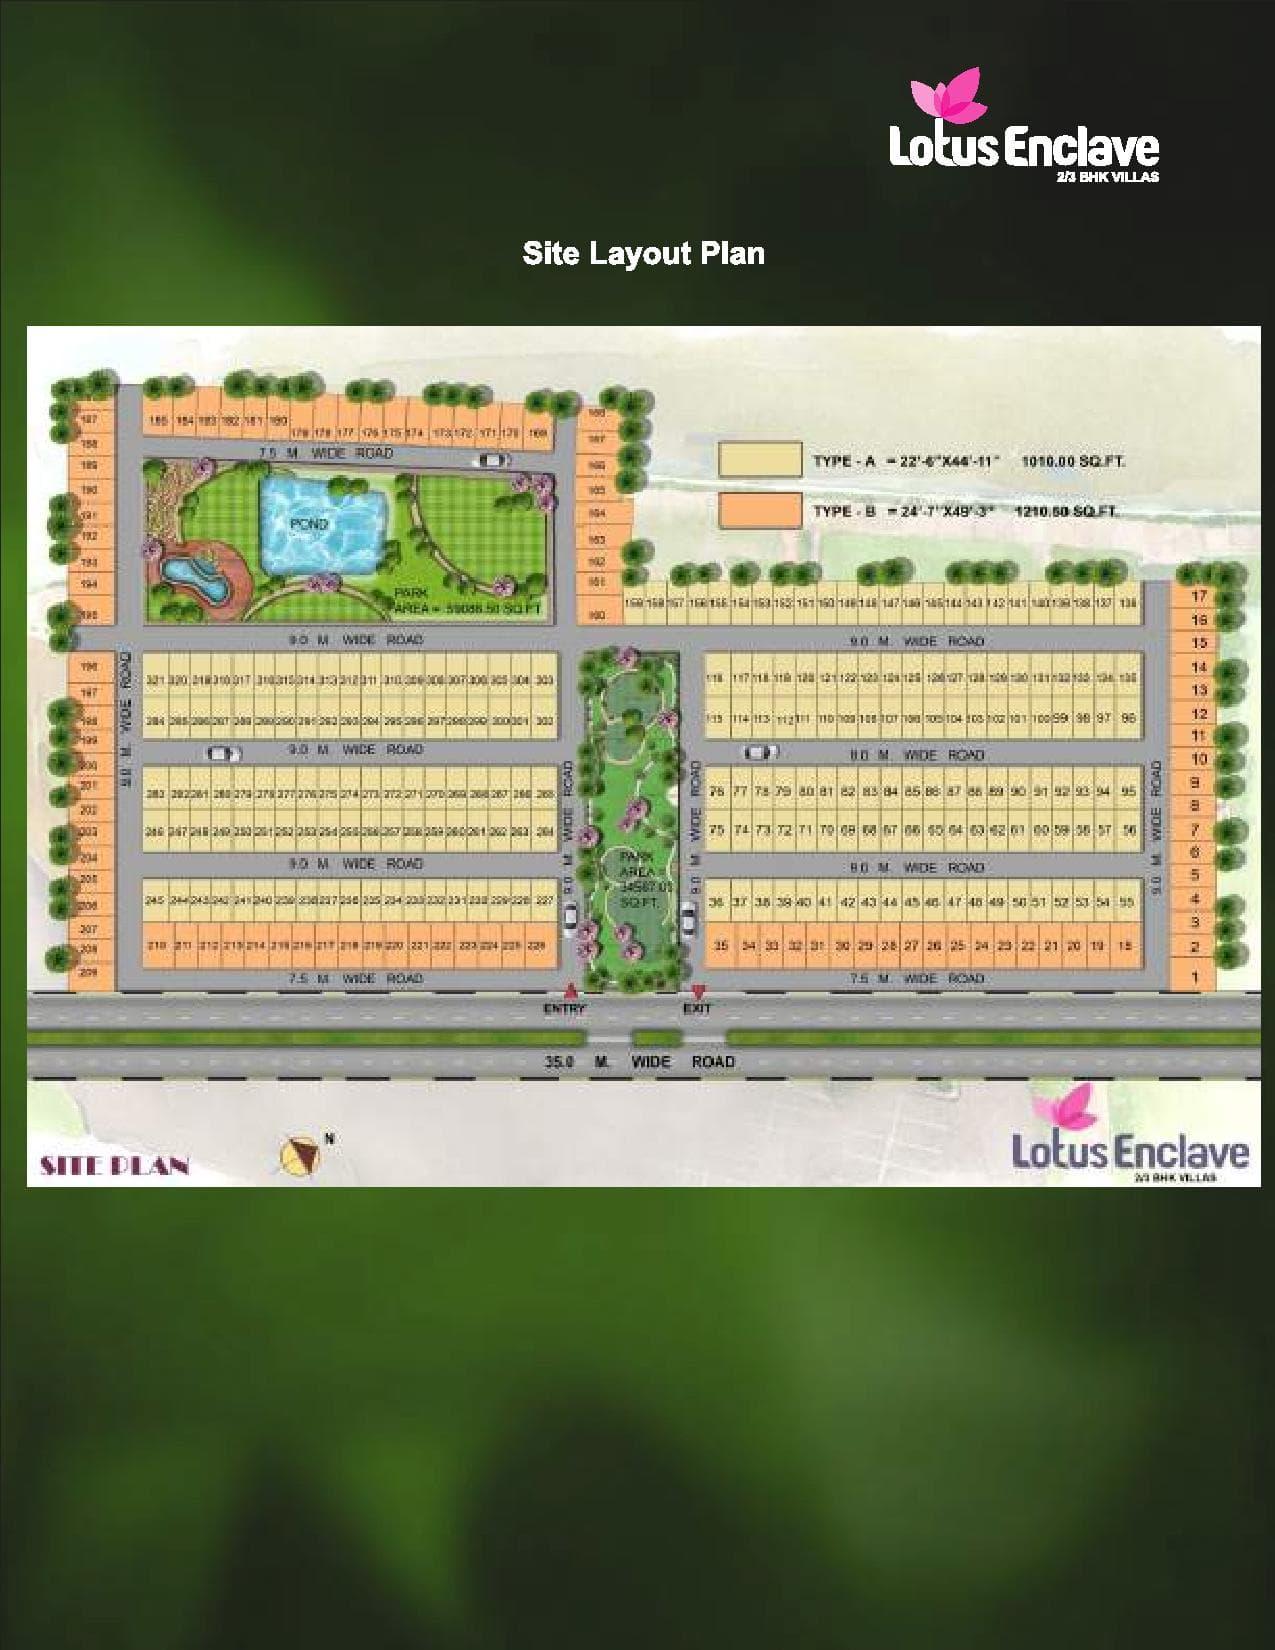 Lotus Enclave Site Plan